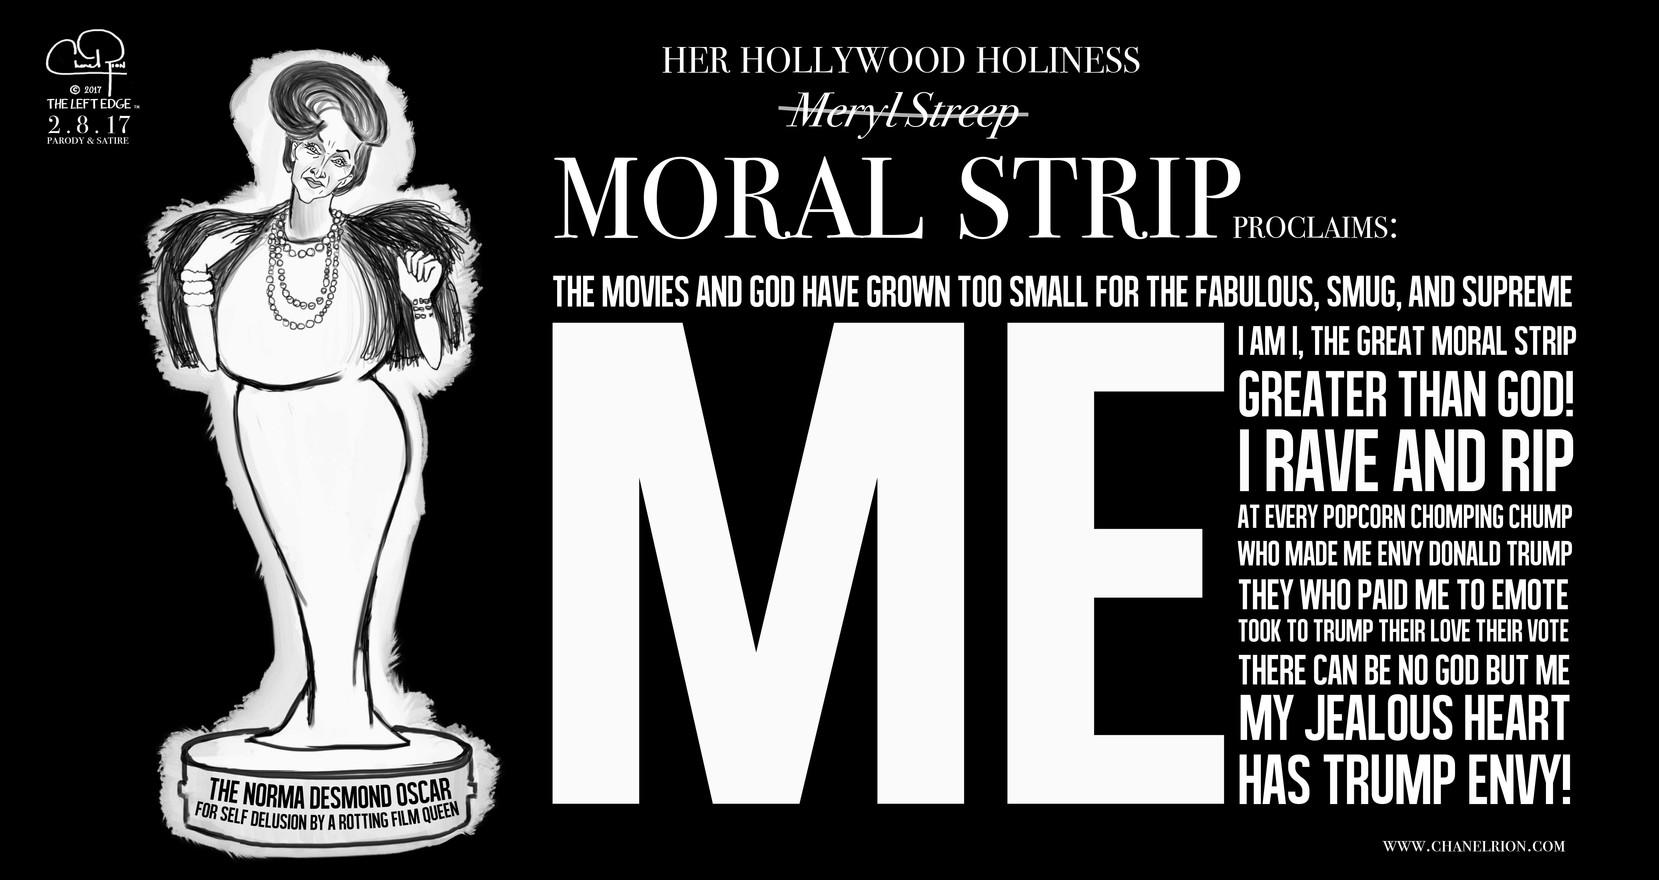 Her Hollywood Holiness Moral Strip